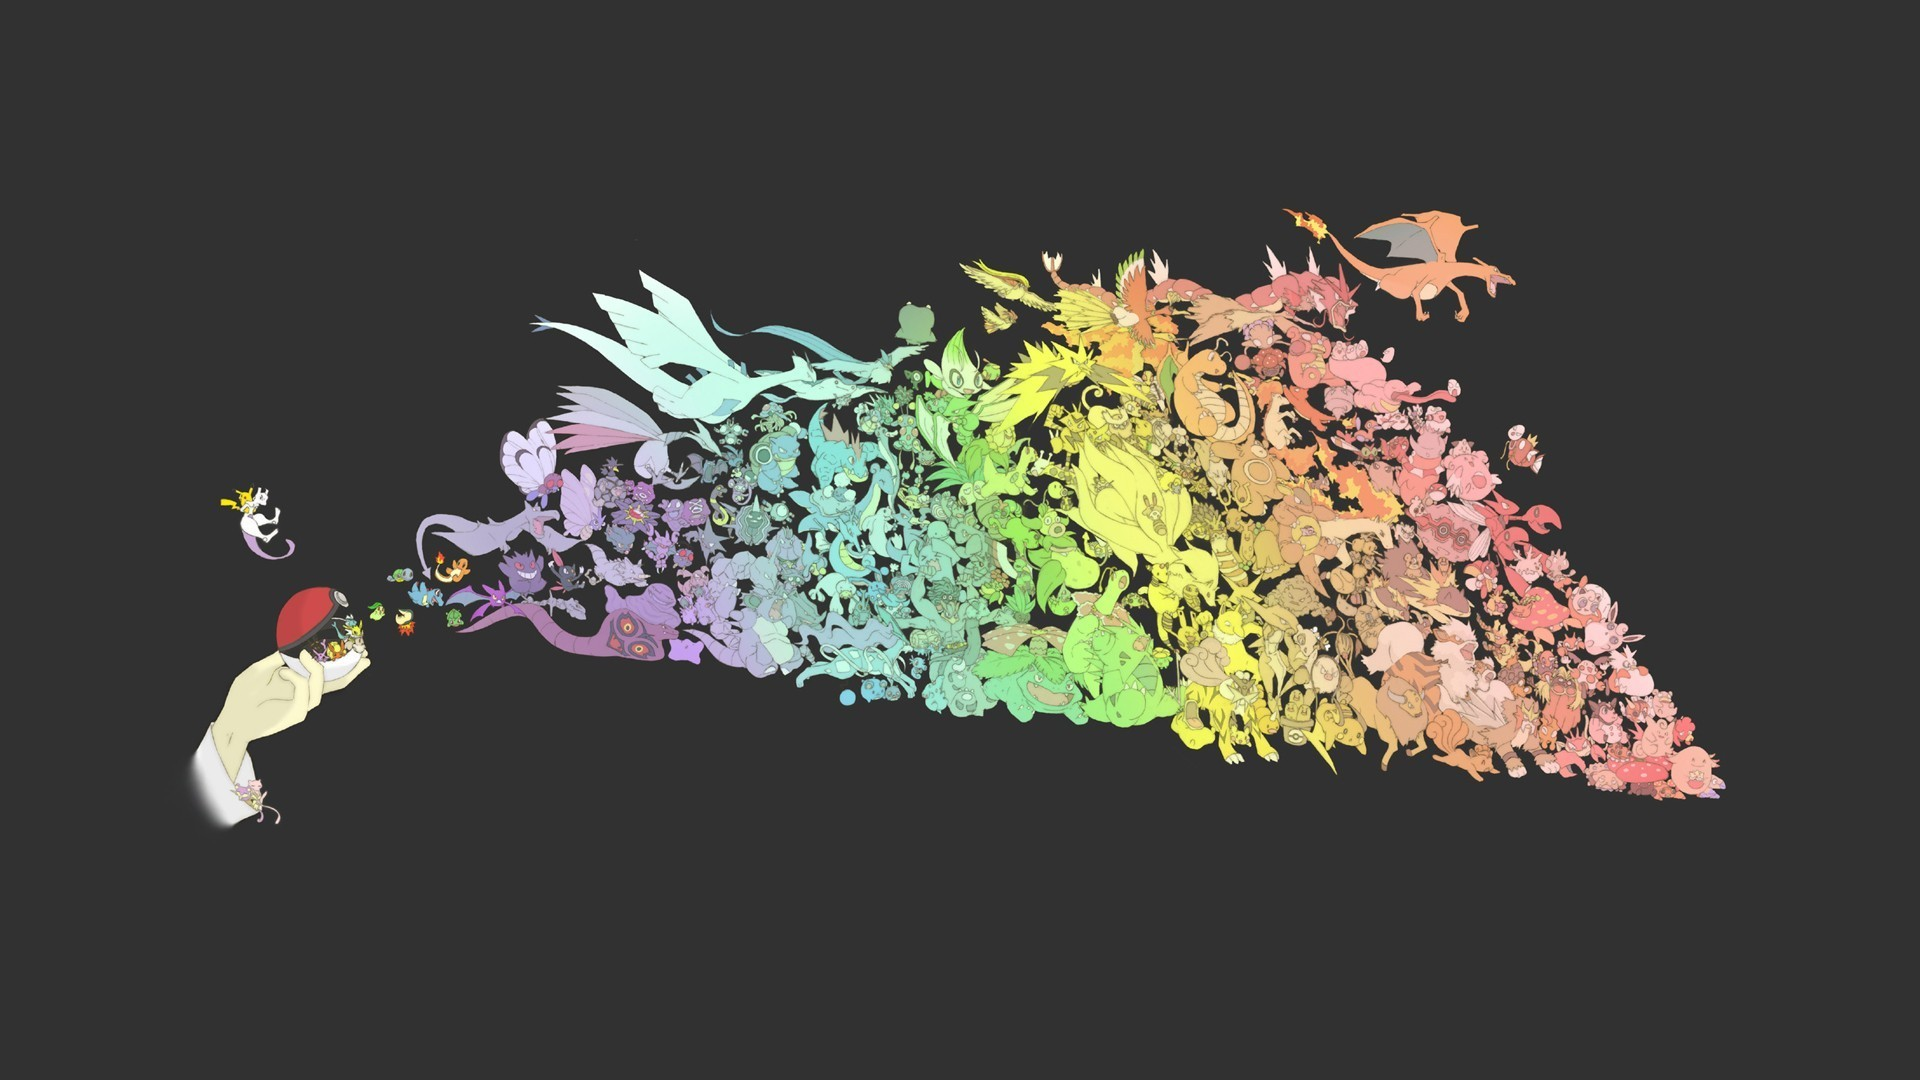 Pokemon HD Wallpapers p 1600×900 Wallpaper Pokemon (43 Wallpapers)    Adorable Wallpapers